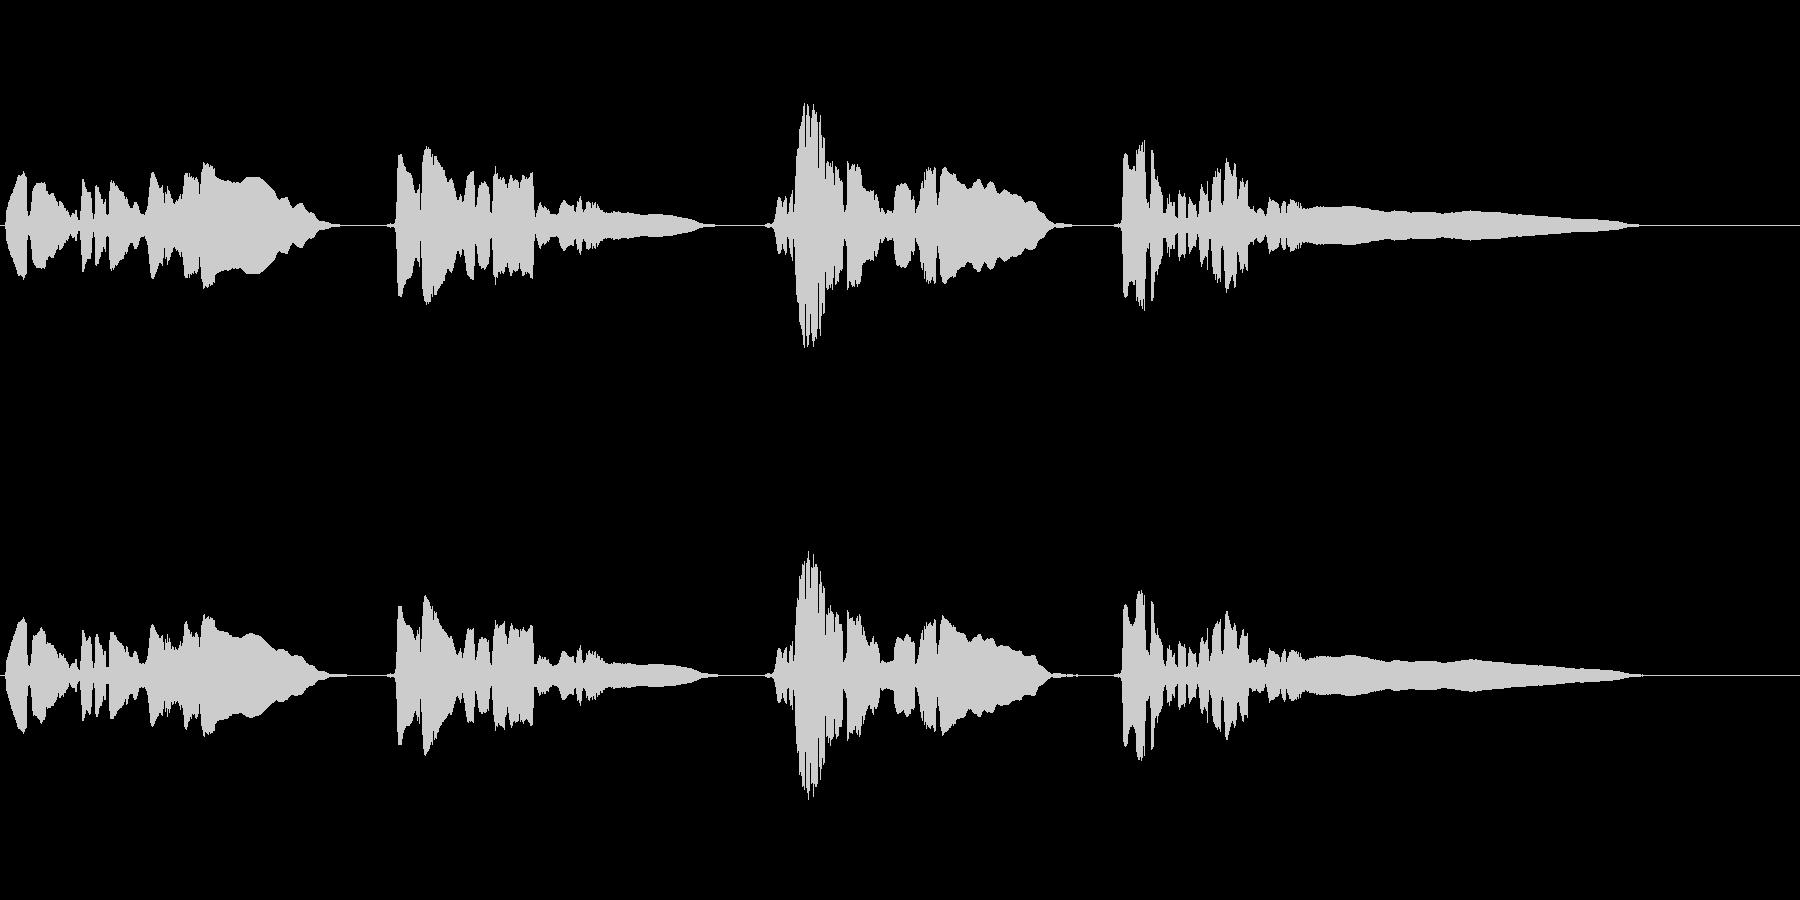 saxの官能メロディーの曲です。の未再生の波形